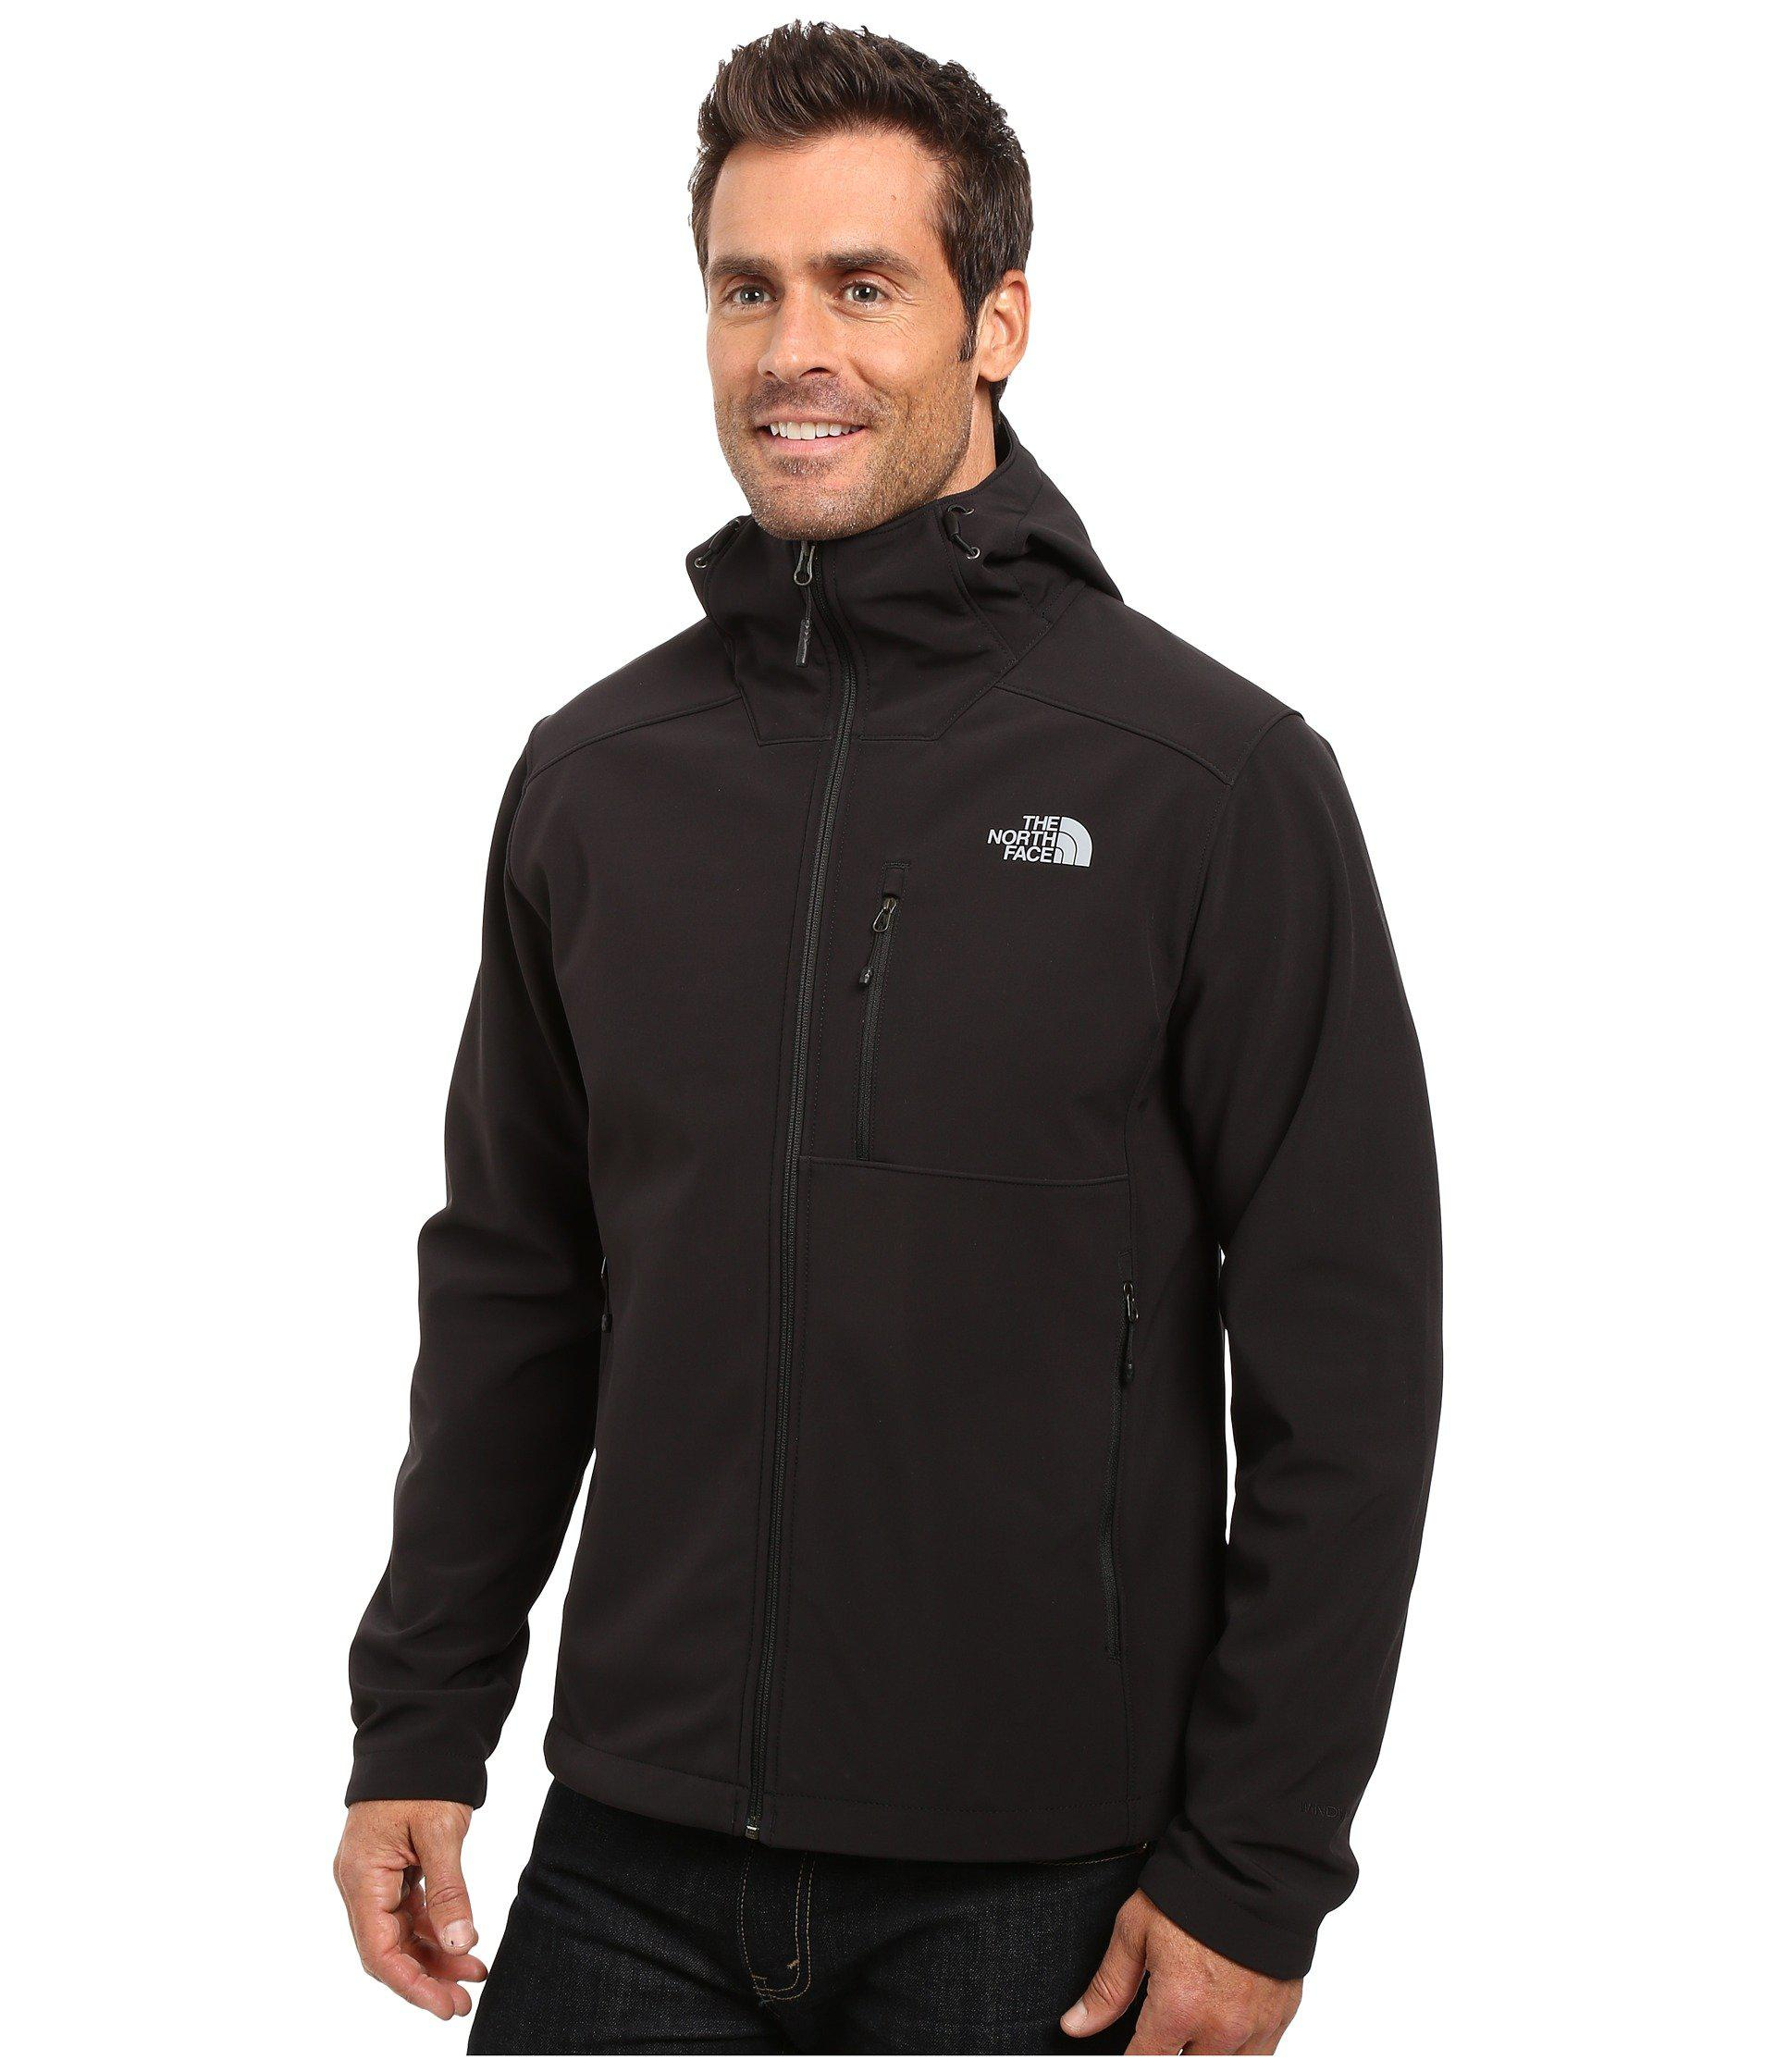 e7abd48b54f9 Lyst - The North Face Apex Bionic 2 Hoodie (tnf Medium Grey Heather tnf  Medium Grey Heather) Men s Sweatshirt for Men - Save 4%